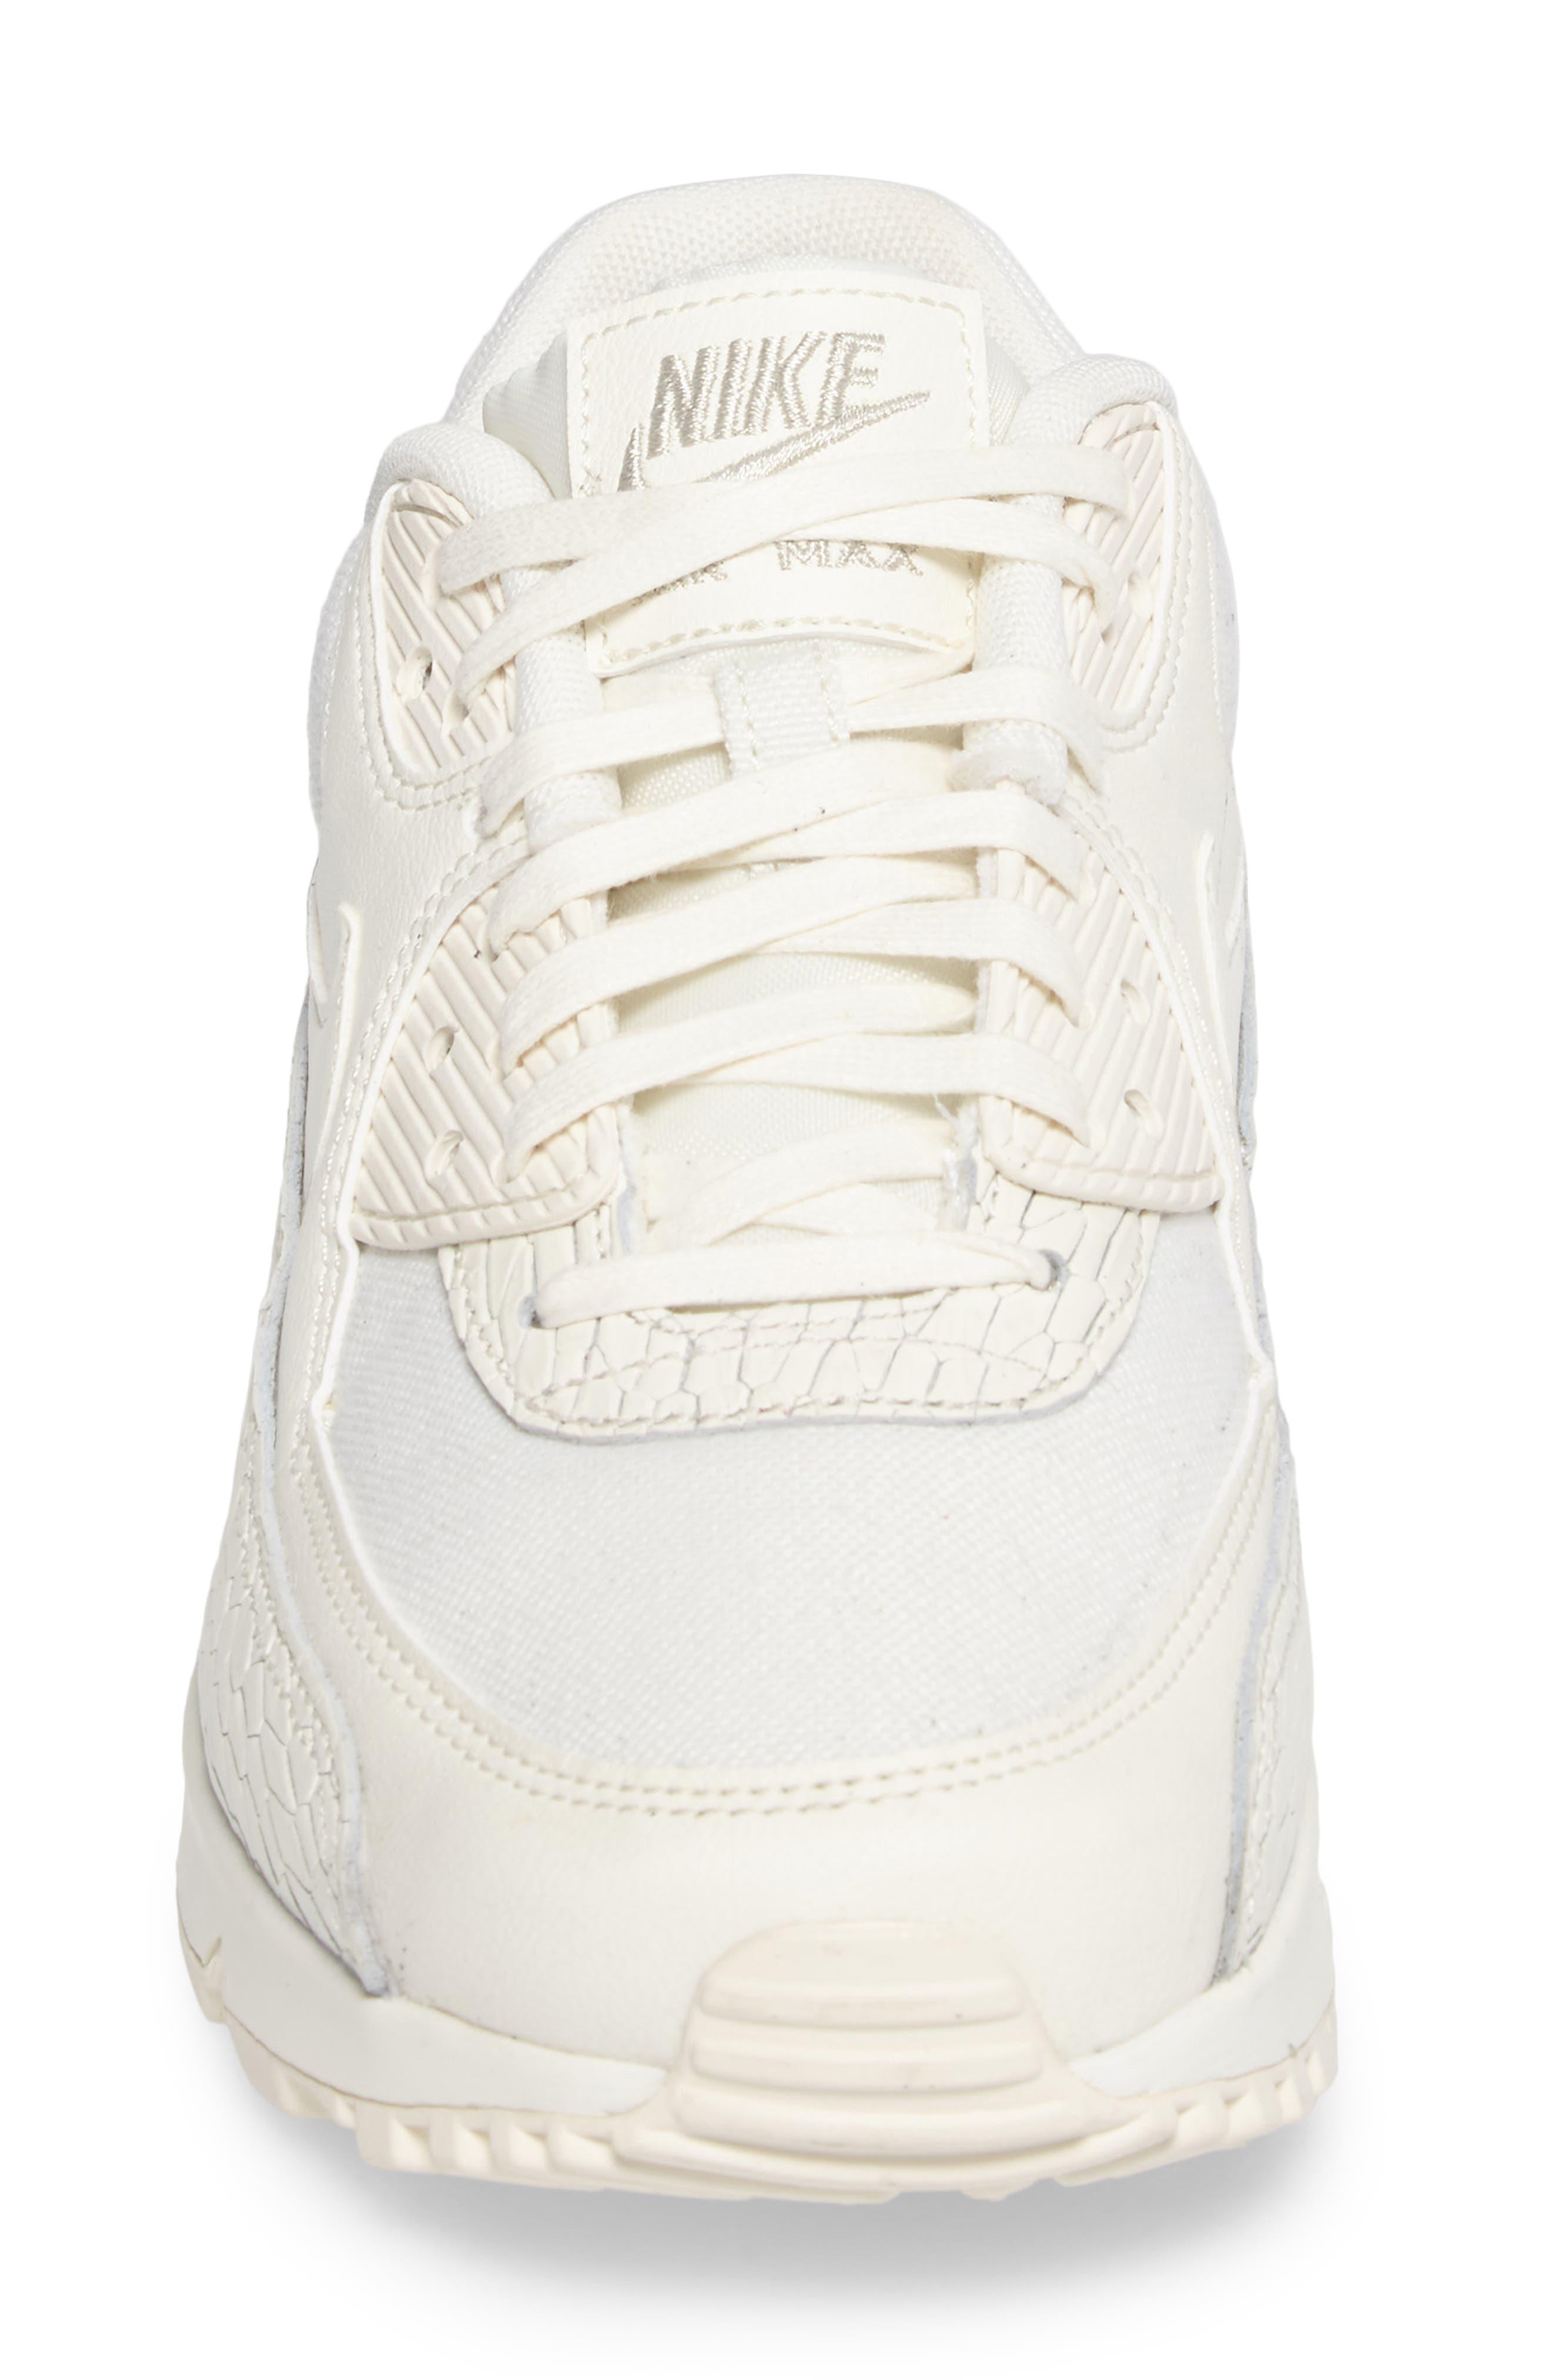 Air Max 90 Premium Leather Sneaker,                             Alternate thumbnail 4, color,                             250